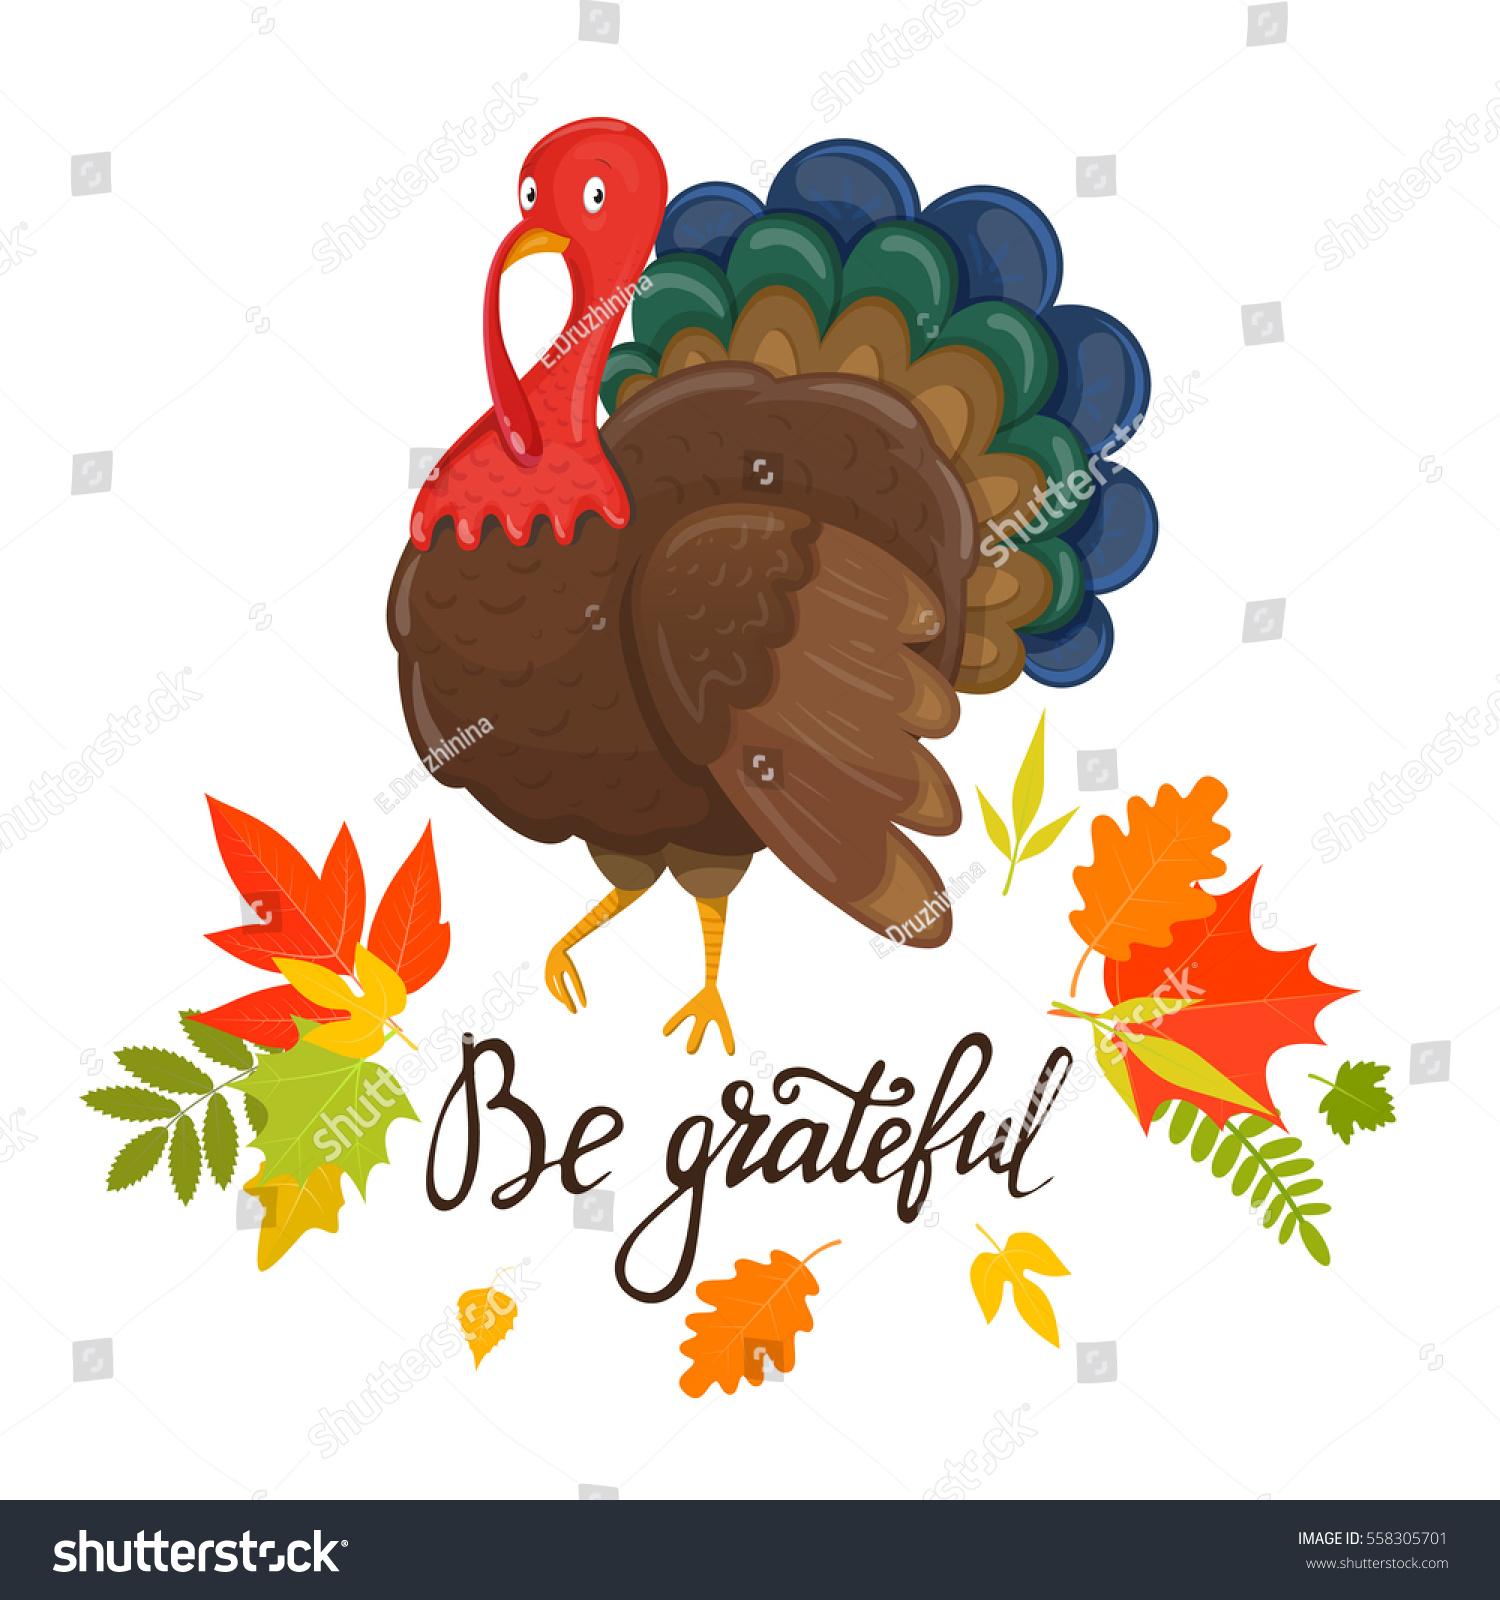 Thanksgiving Day Greetings Be Grateful Thanksgiving Stock